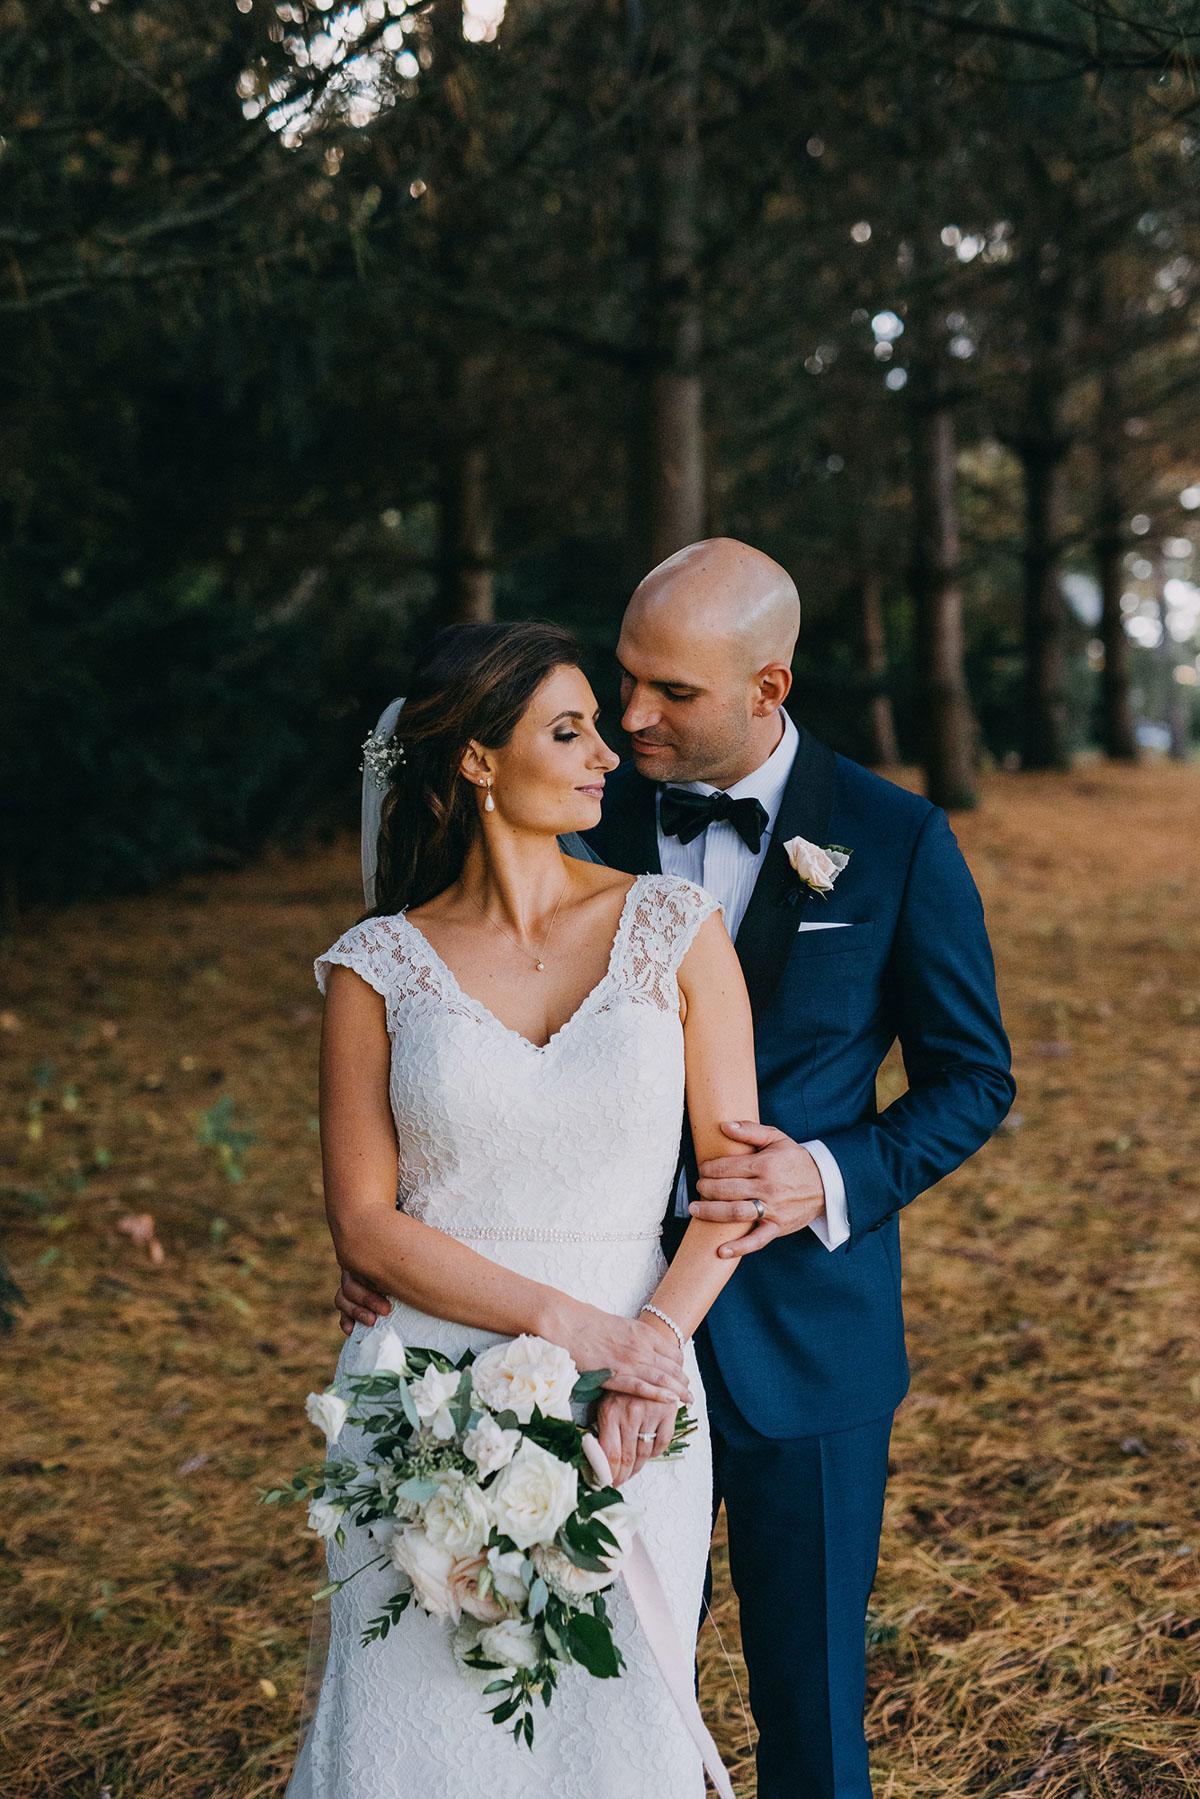 shaw-events-vineyard-bride-swish-list-kurtz-orchards-niagara-on-the-lake-wedding-78.jpg